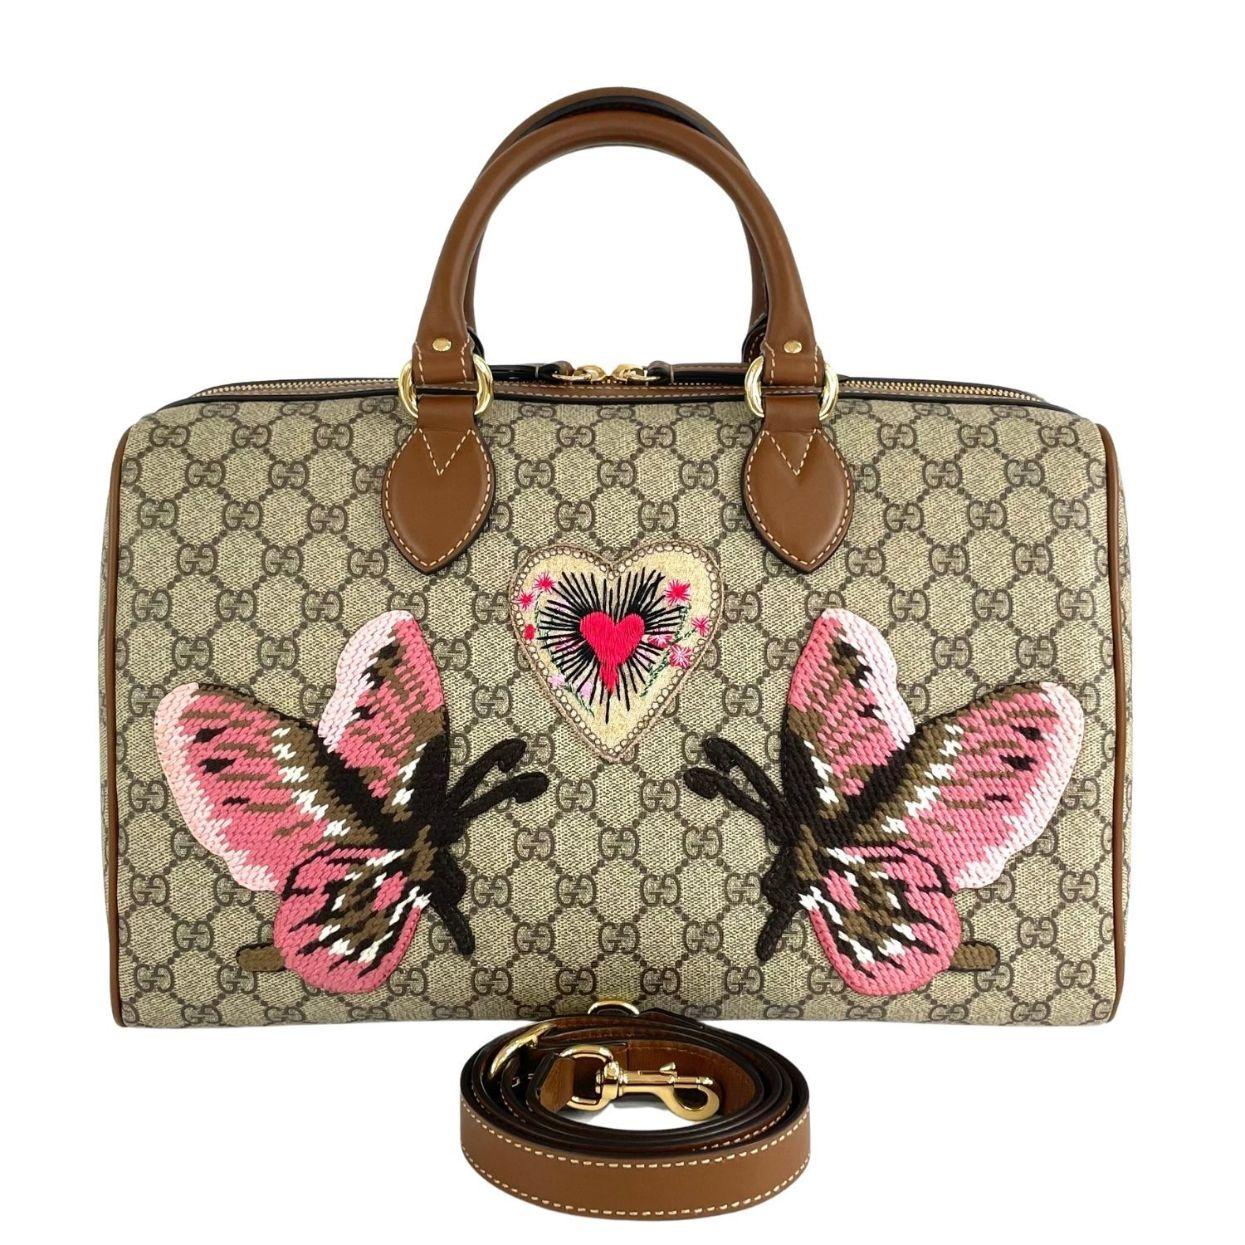 Bolsa Gucci Boston GG Supreme Butterfly